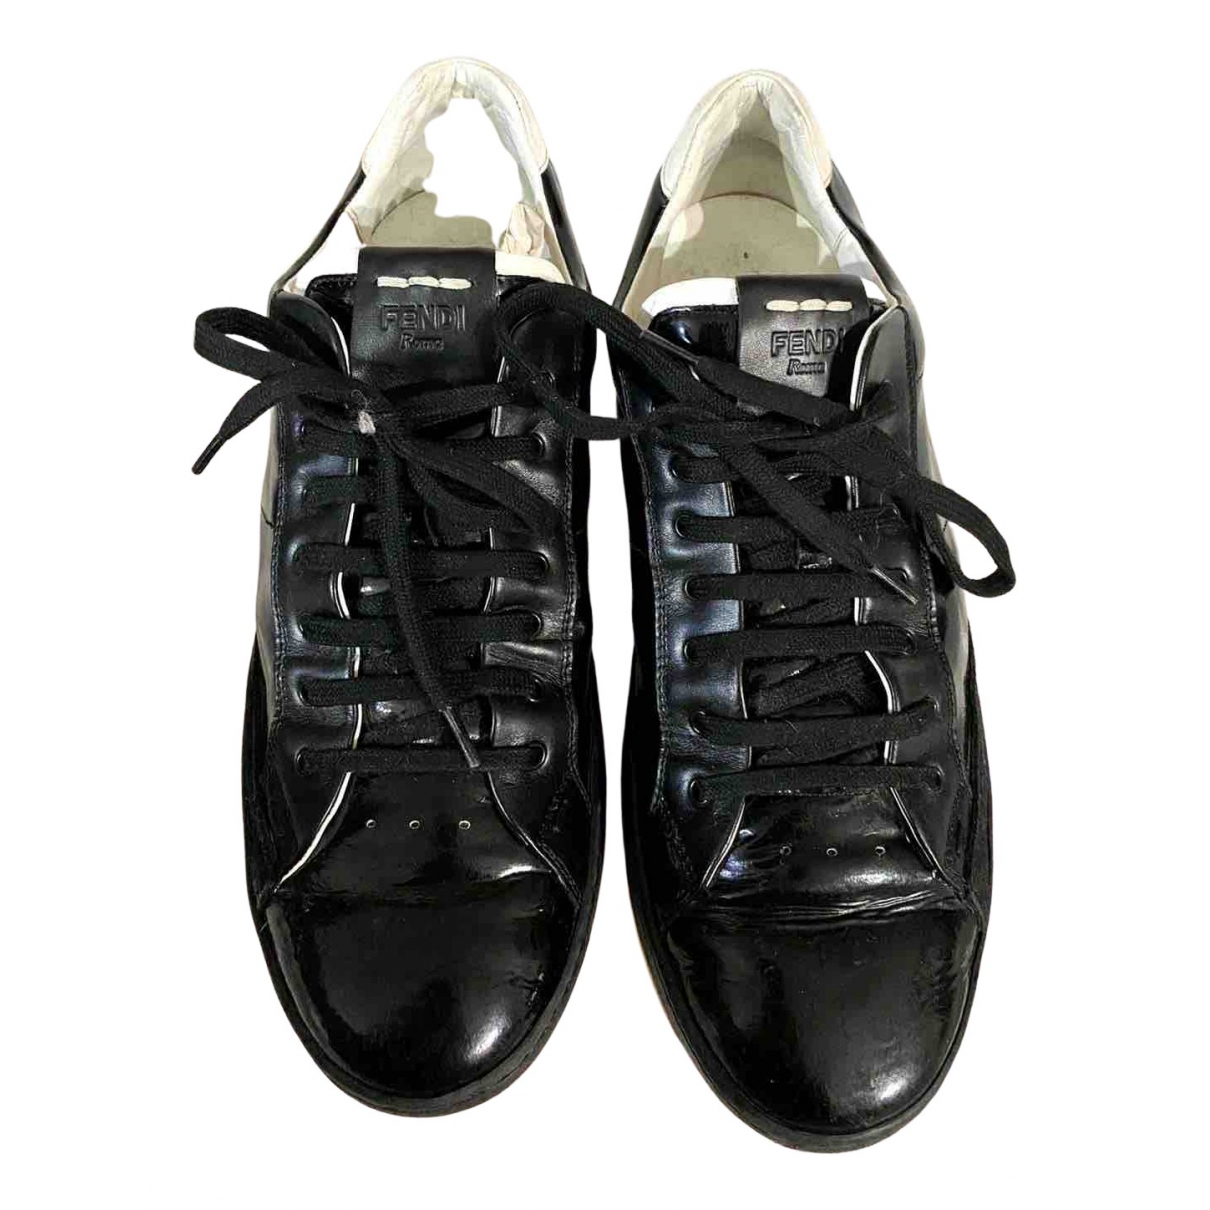 Fendi N Black Leather Trainers for Men 8 UK